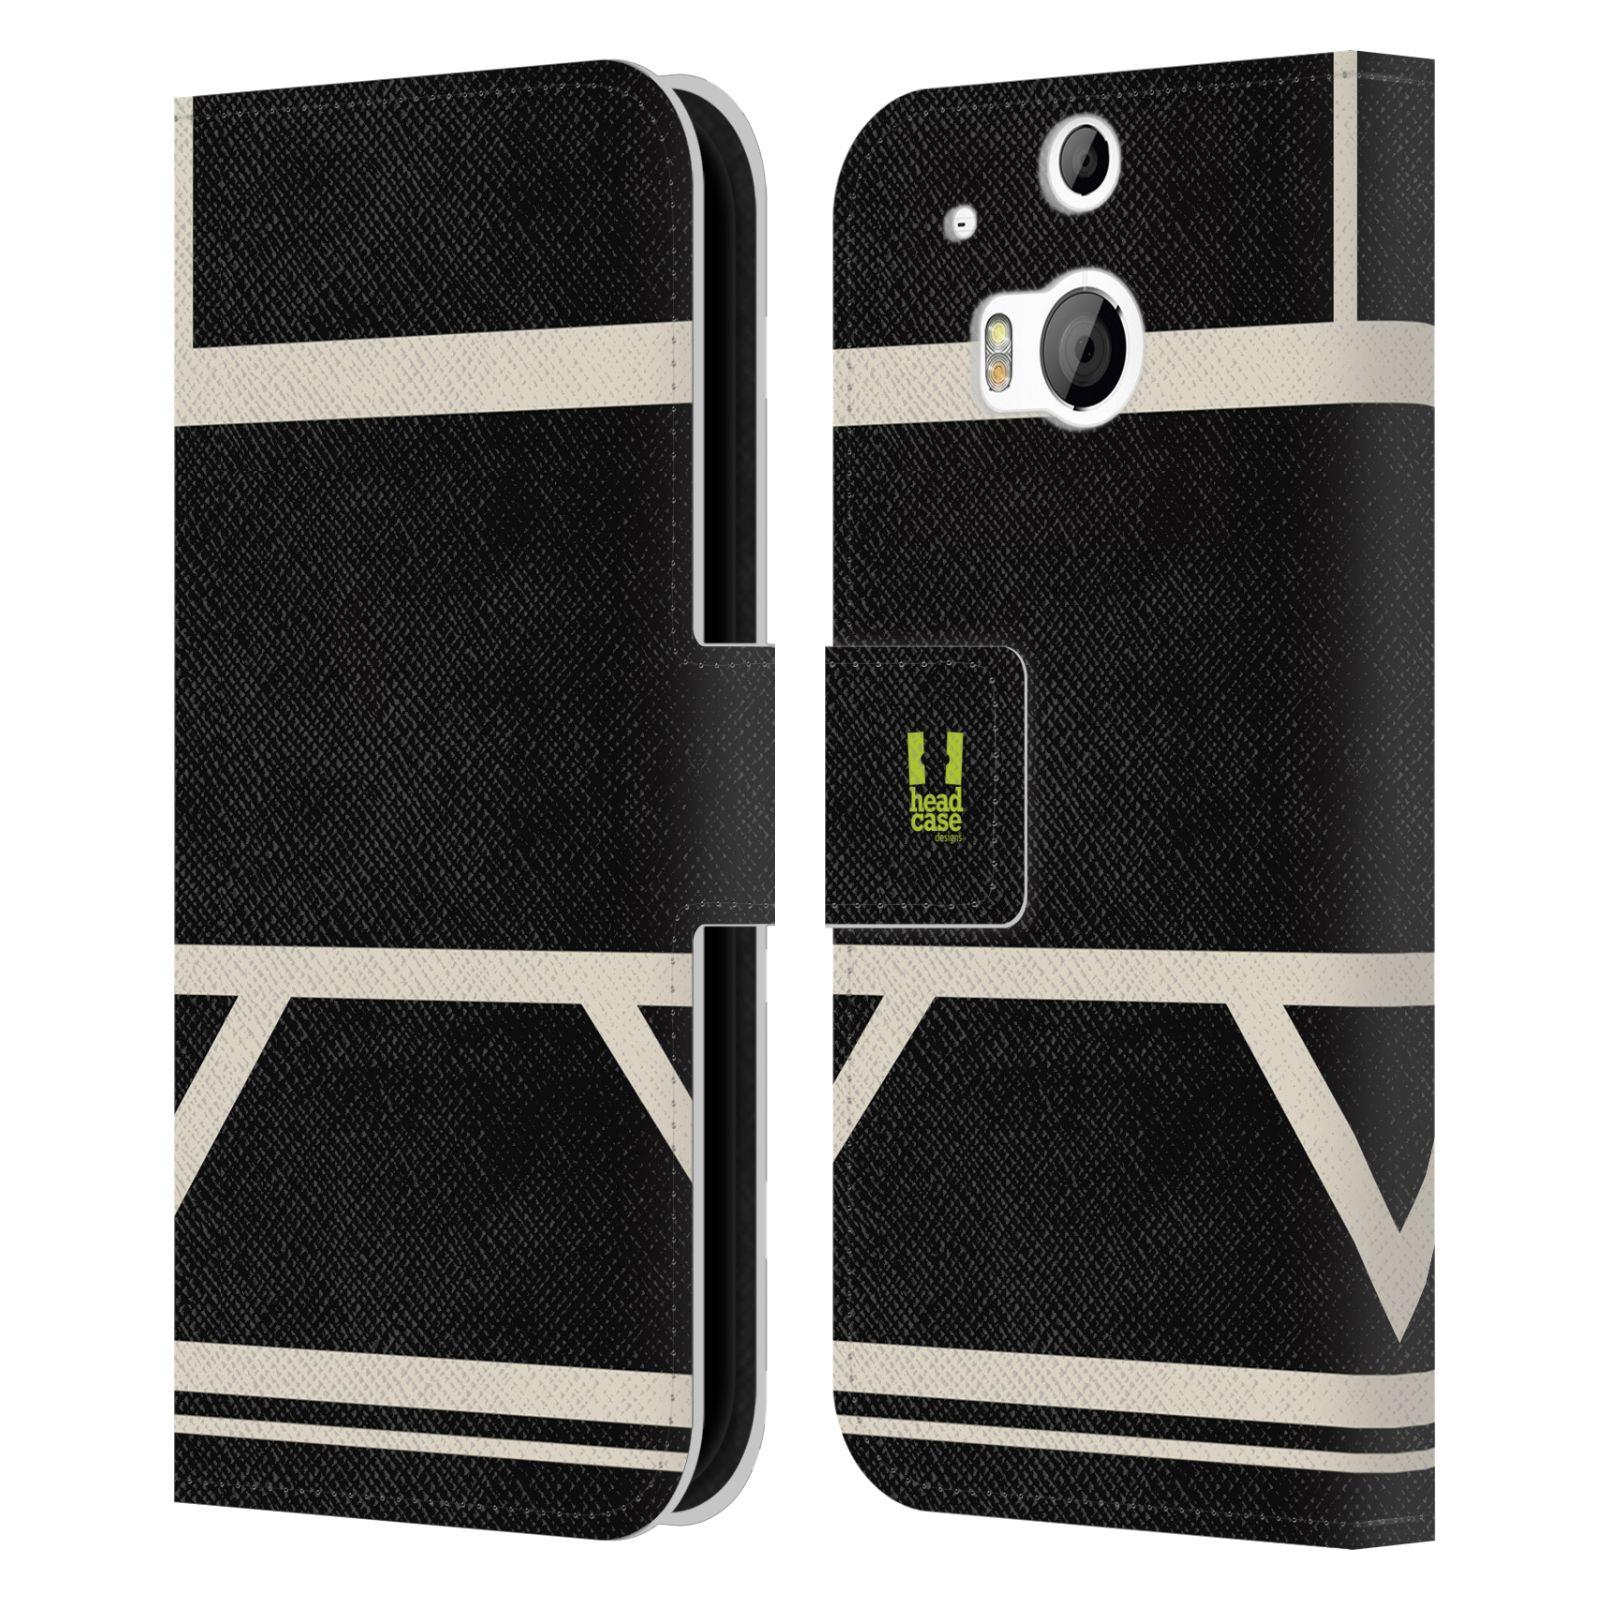 HEAD CASE Flipové pouzdro pro mobil HTC ONE M8/M8s barevné tvary černá a bílá proužek